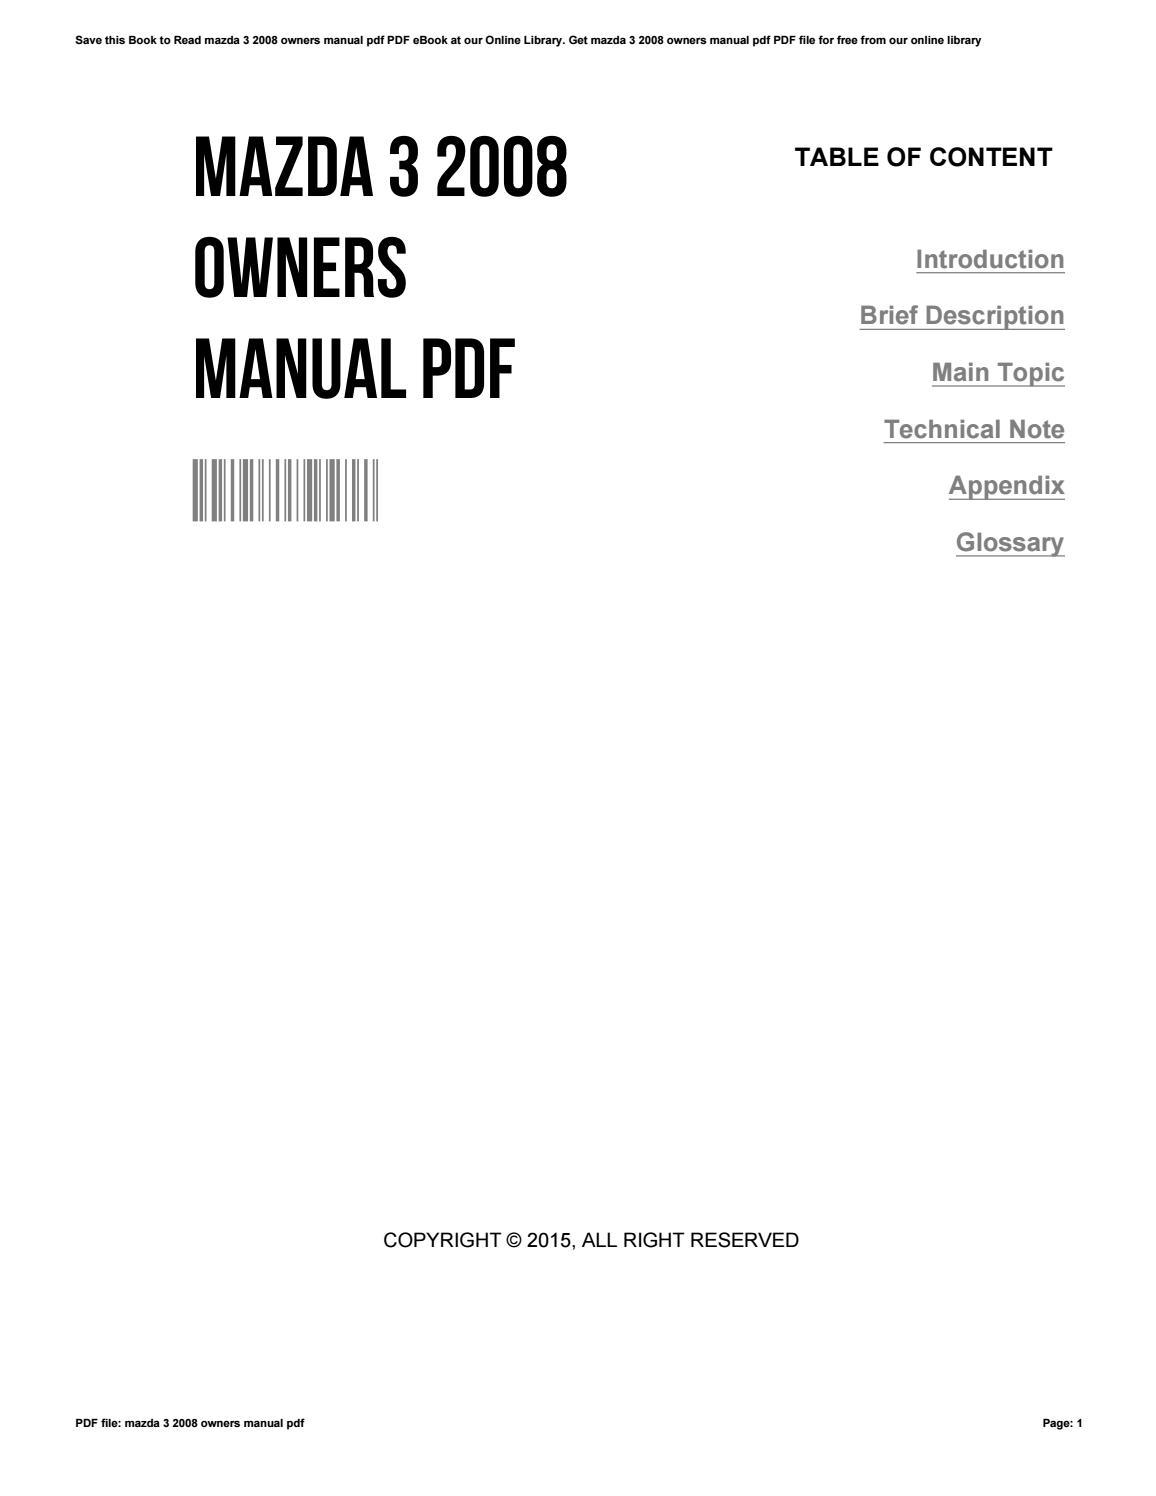 Owners manual 2010 mazda 3.